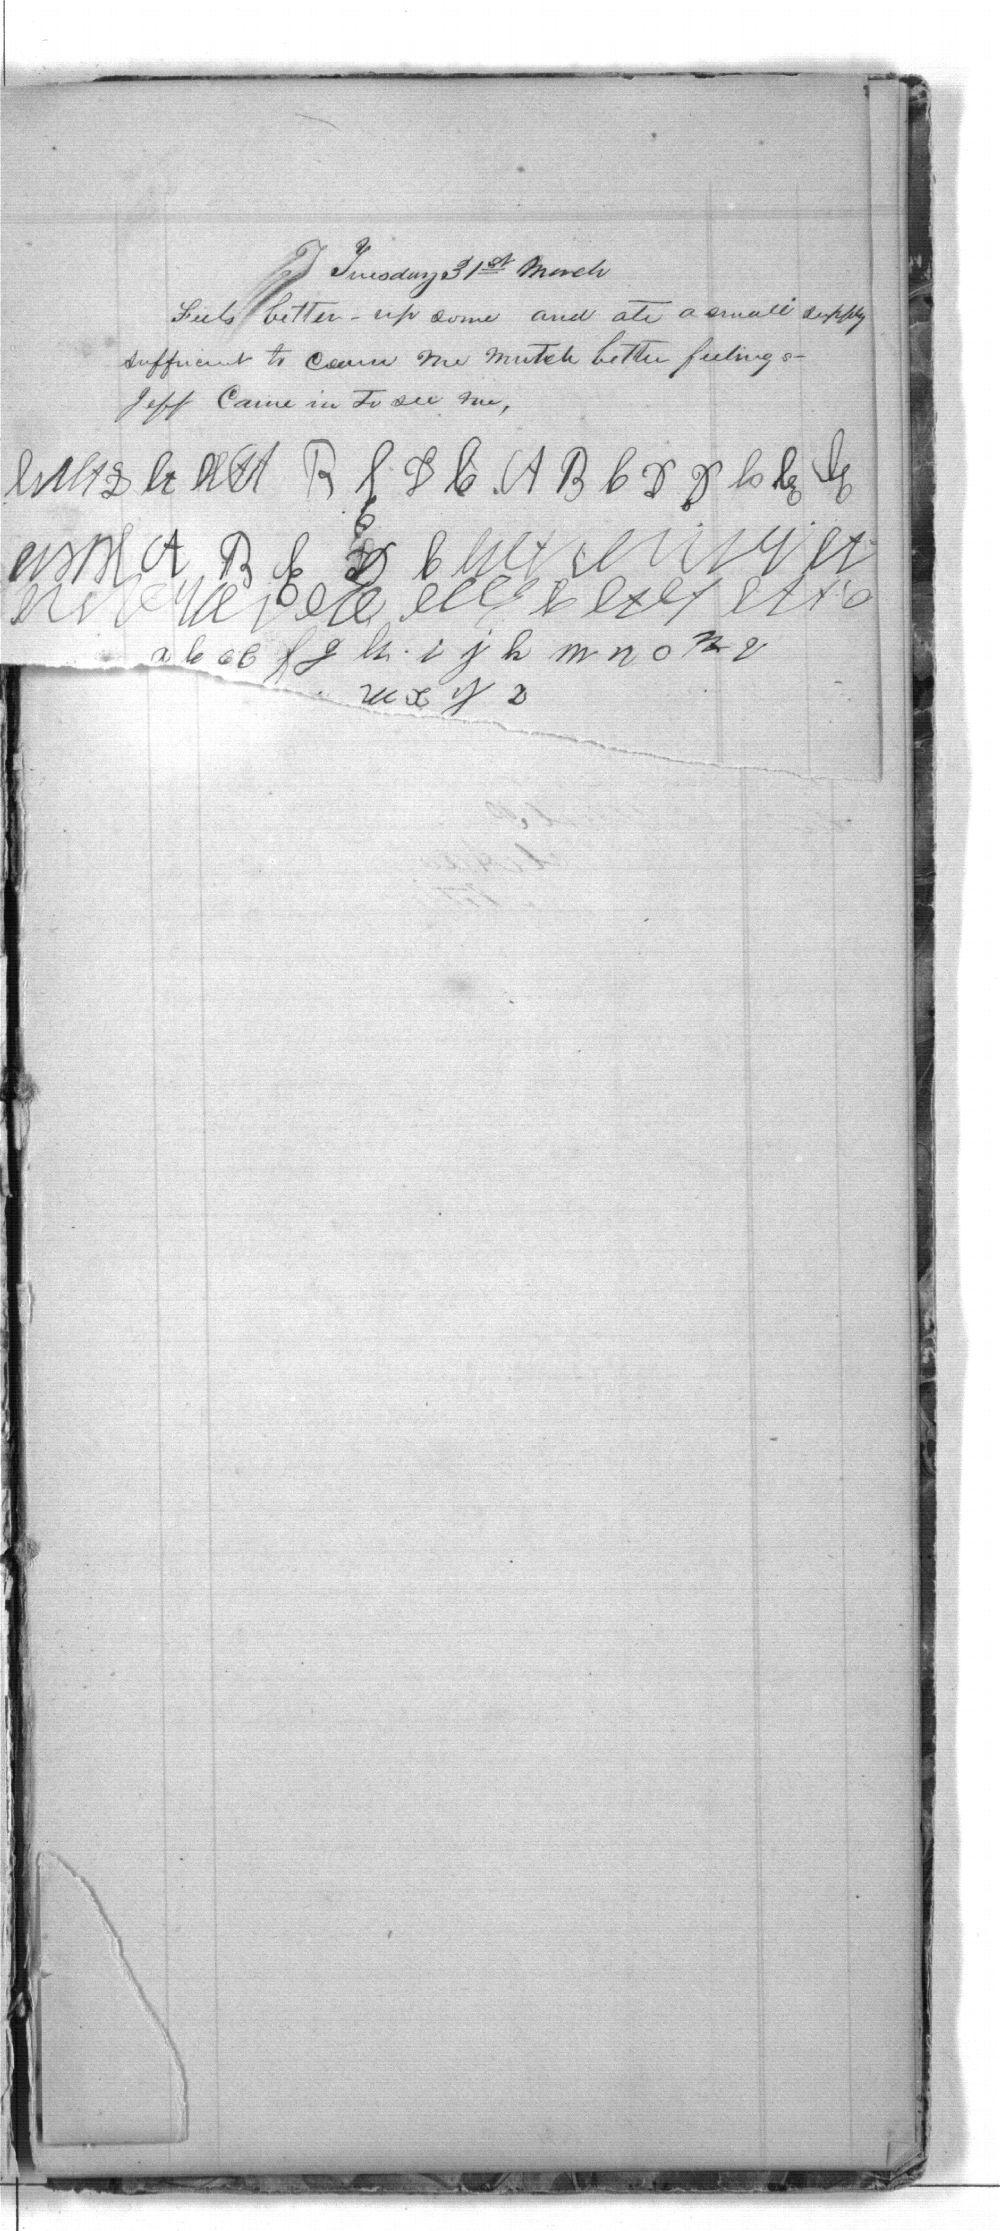 First Cherokee Regiment day book - 99